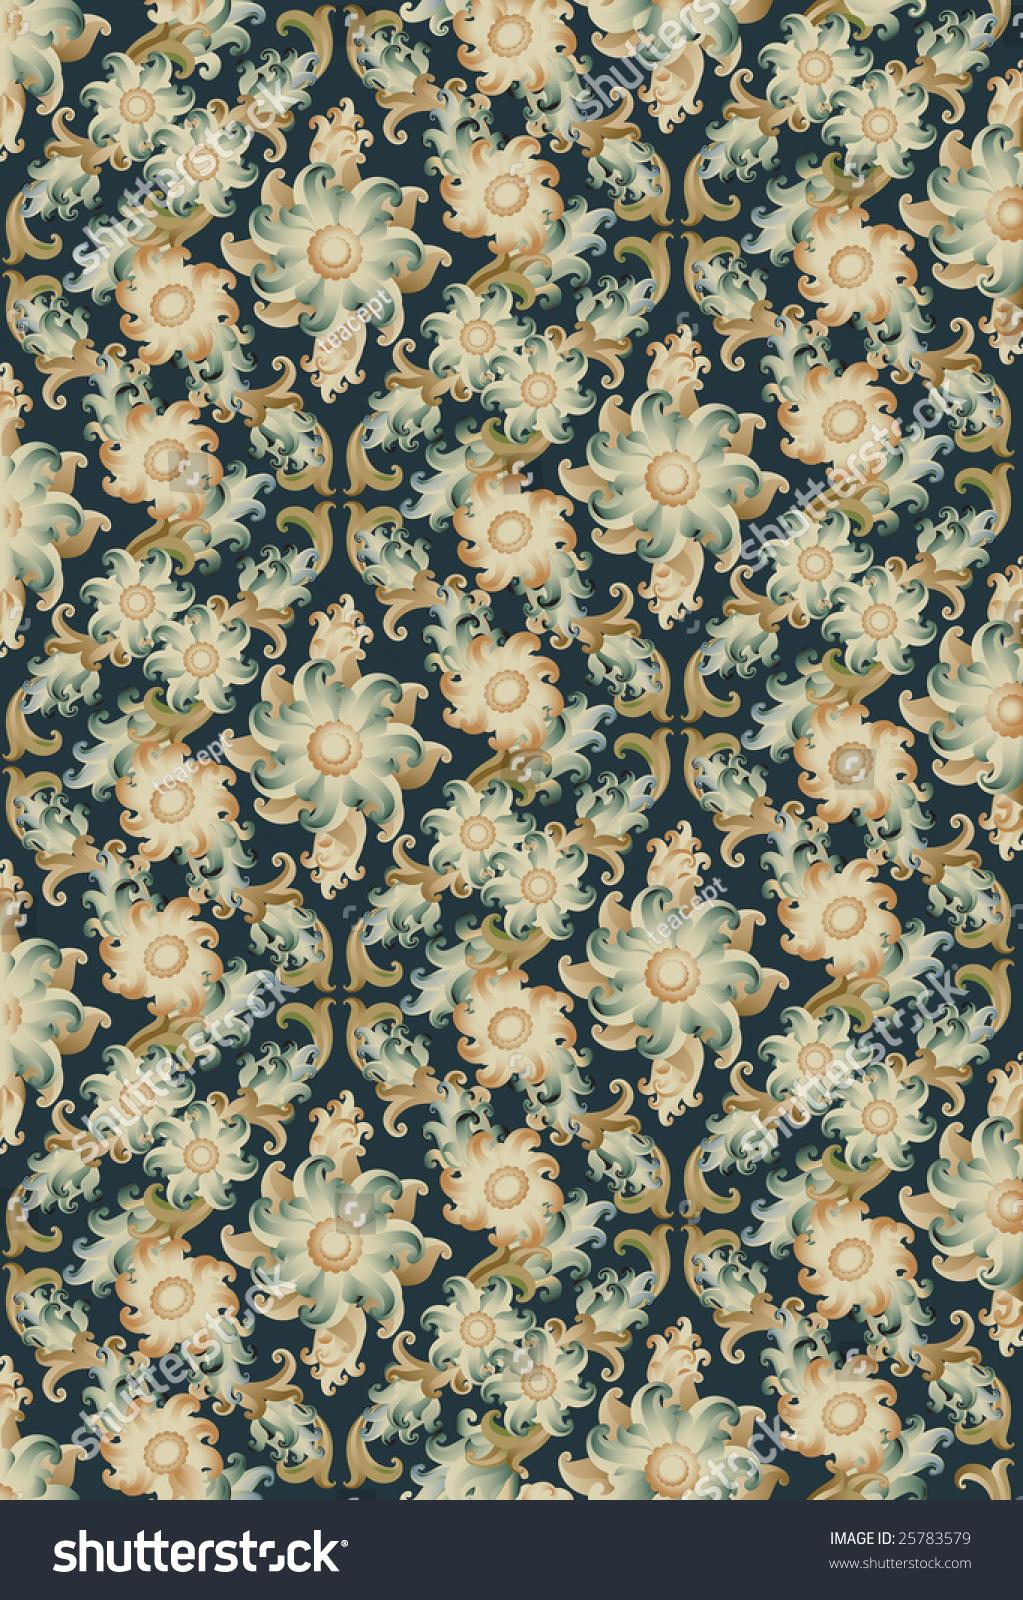 Vintage Floral Wallpaper Vector Stock Vector Royalty Free 25783579